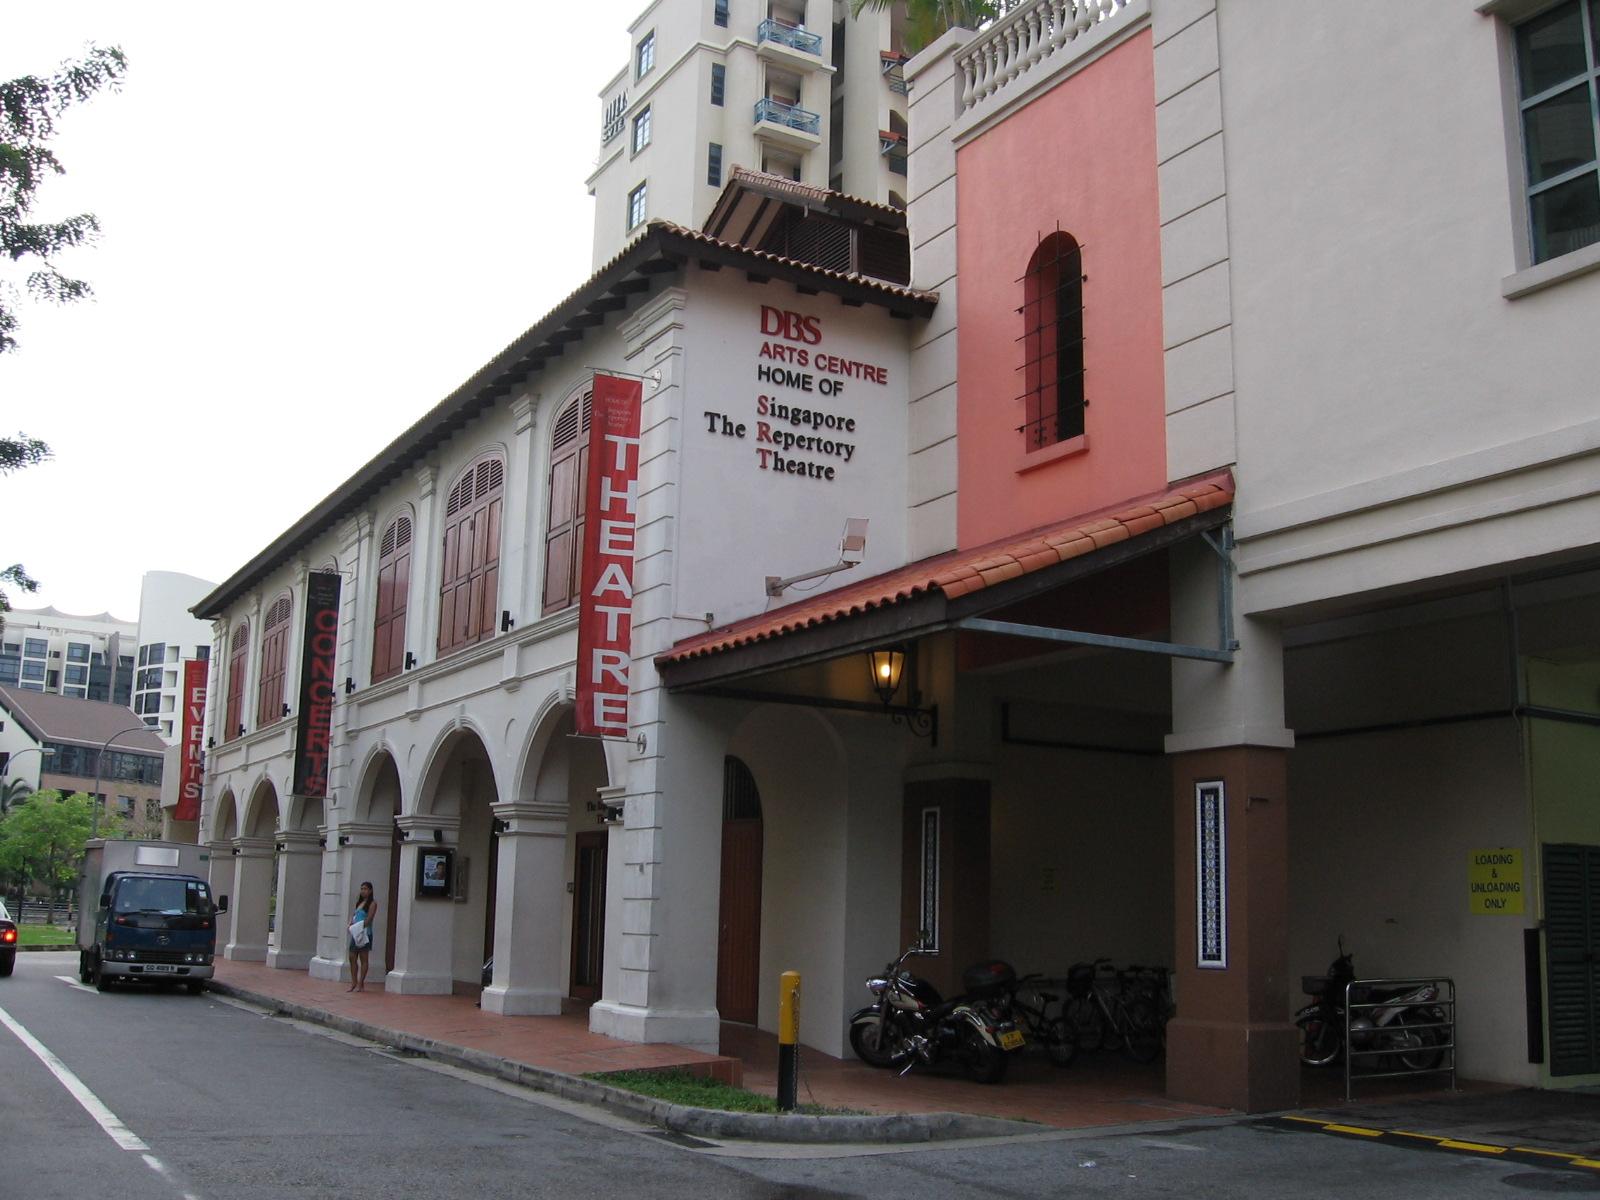 Dbs arts centre home of srt